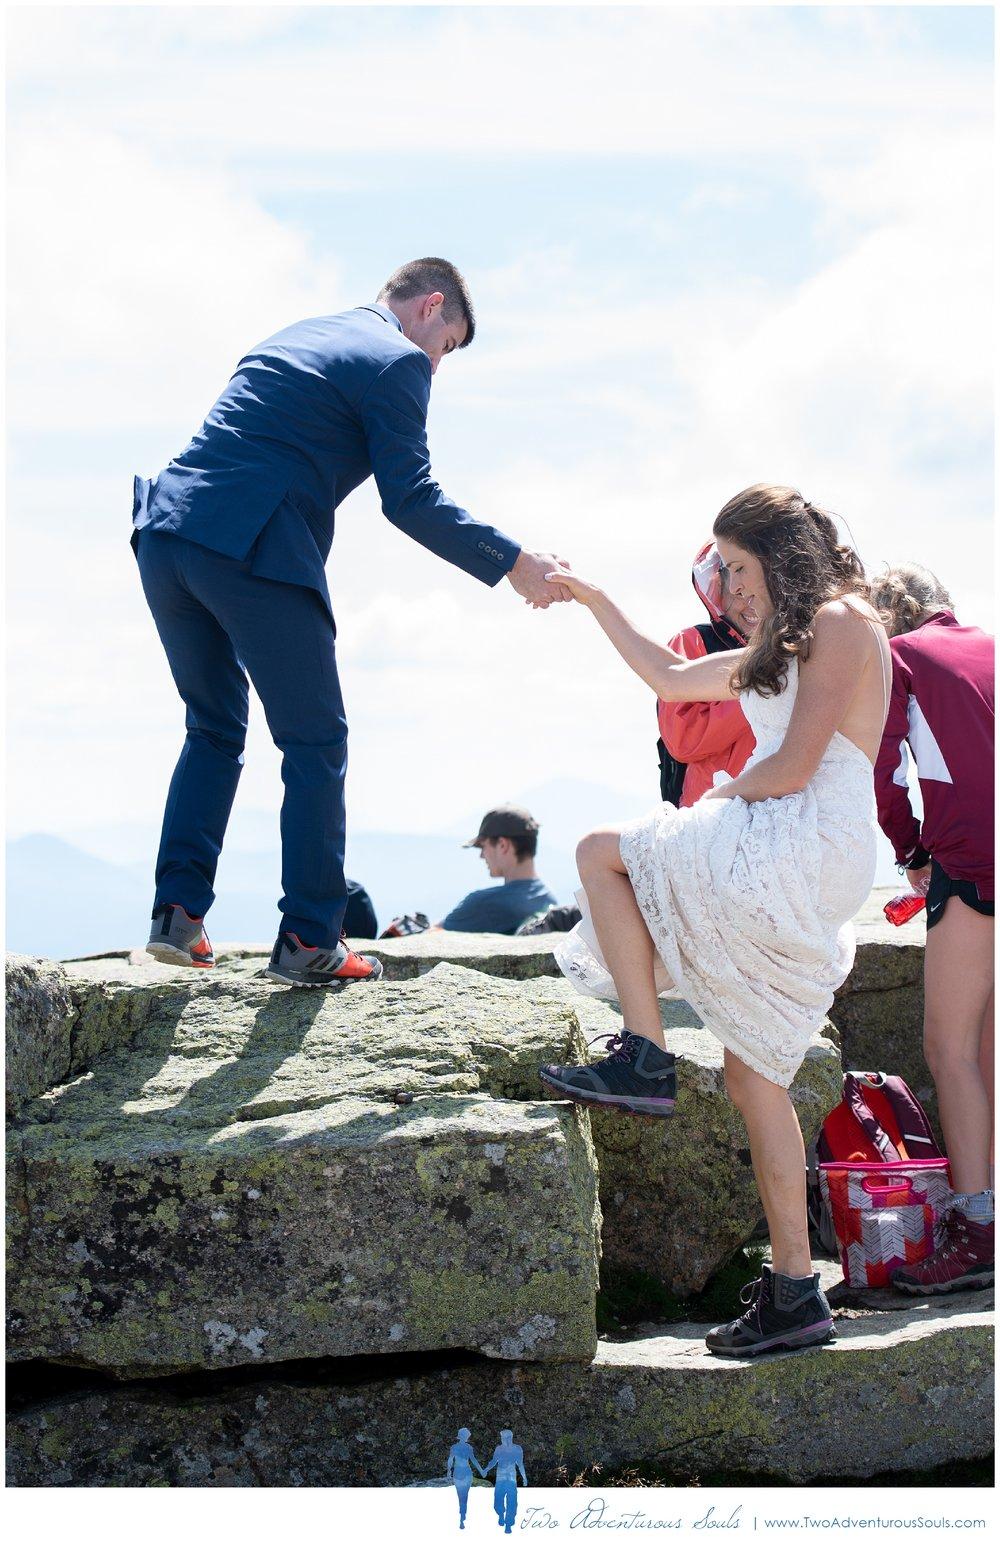 081818 - Chana & Rich - wedding SNEAKS-112_Adventure Wedding, Destination Wedding Photographers.jpg